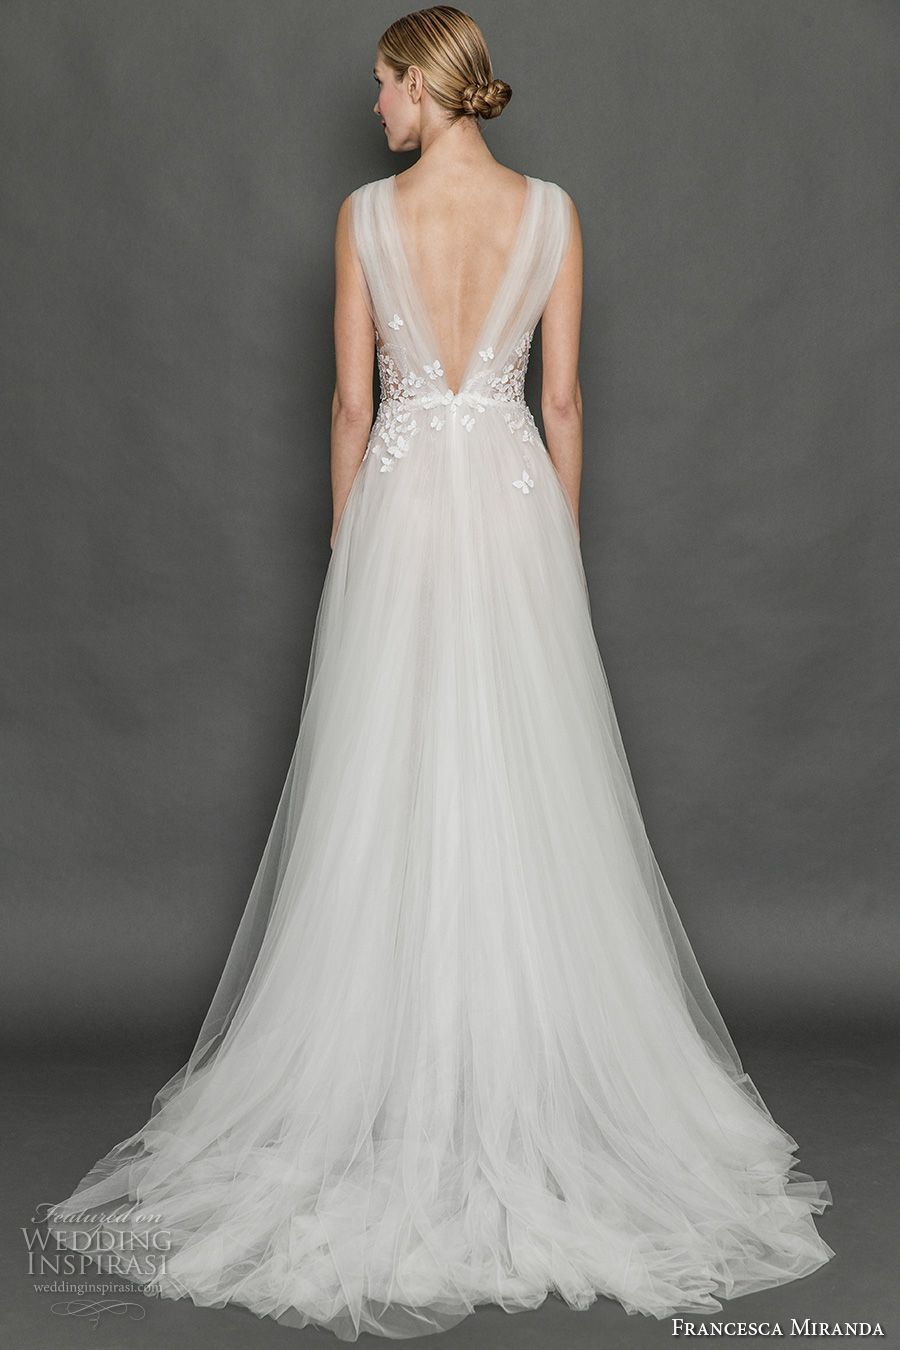 Francesca miranda fall bridal sleeveless thick strap deep v